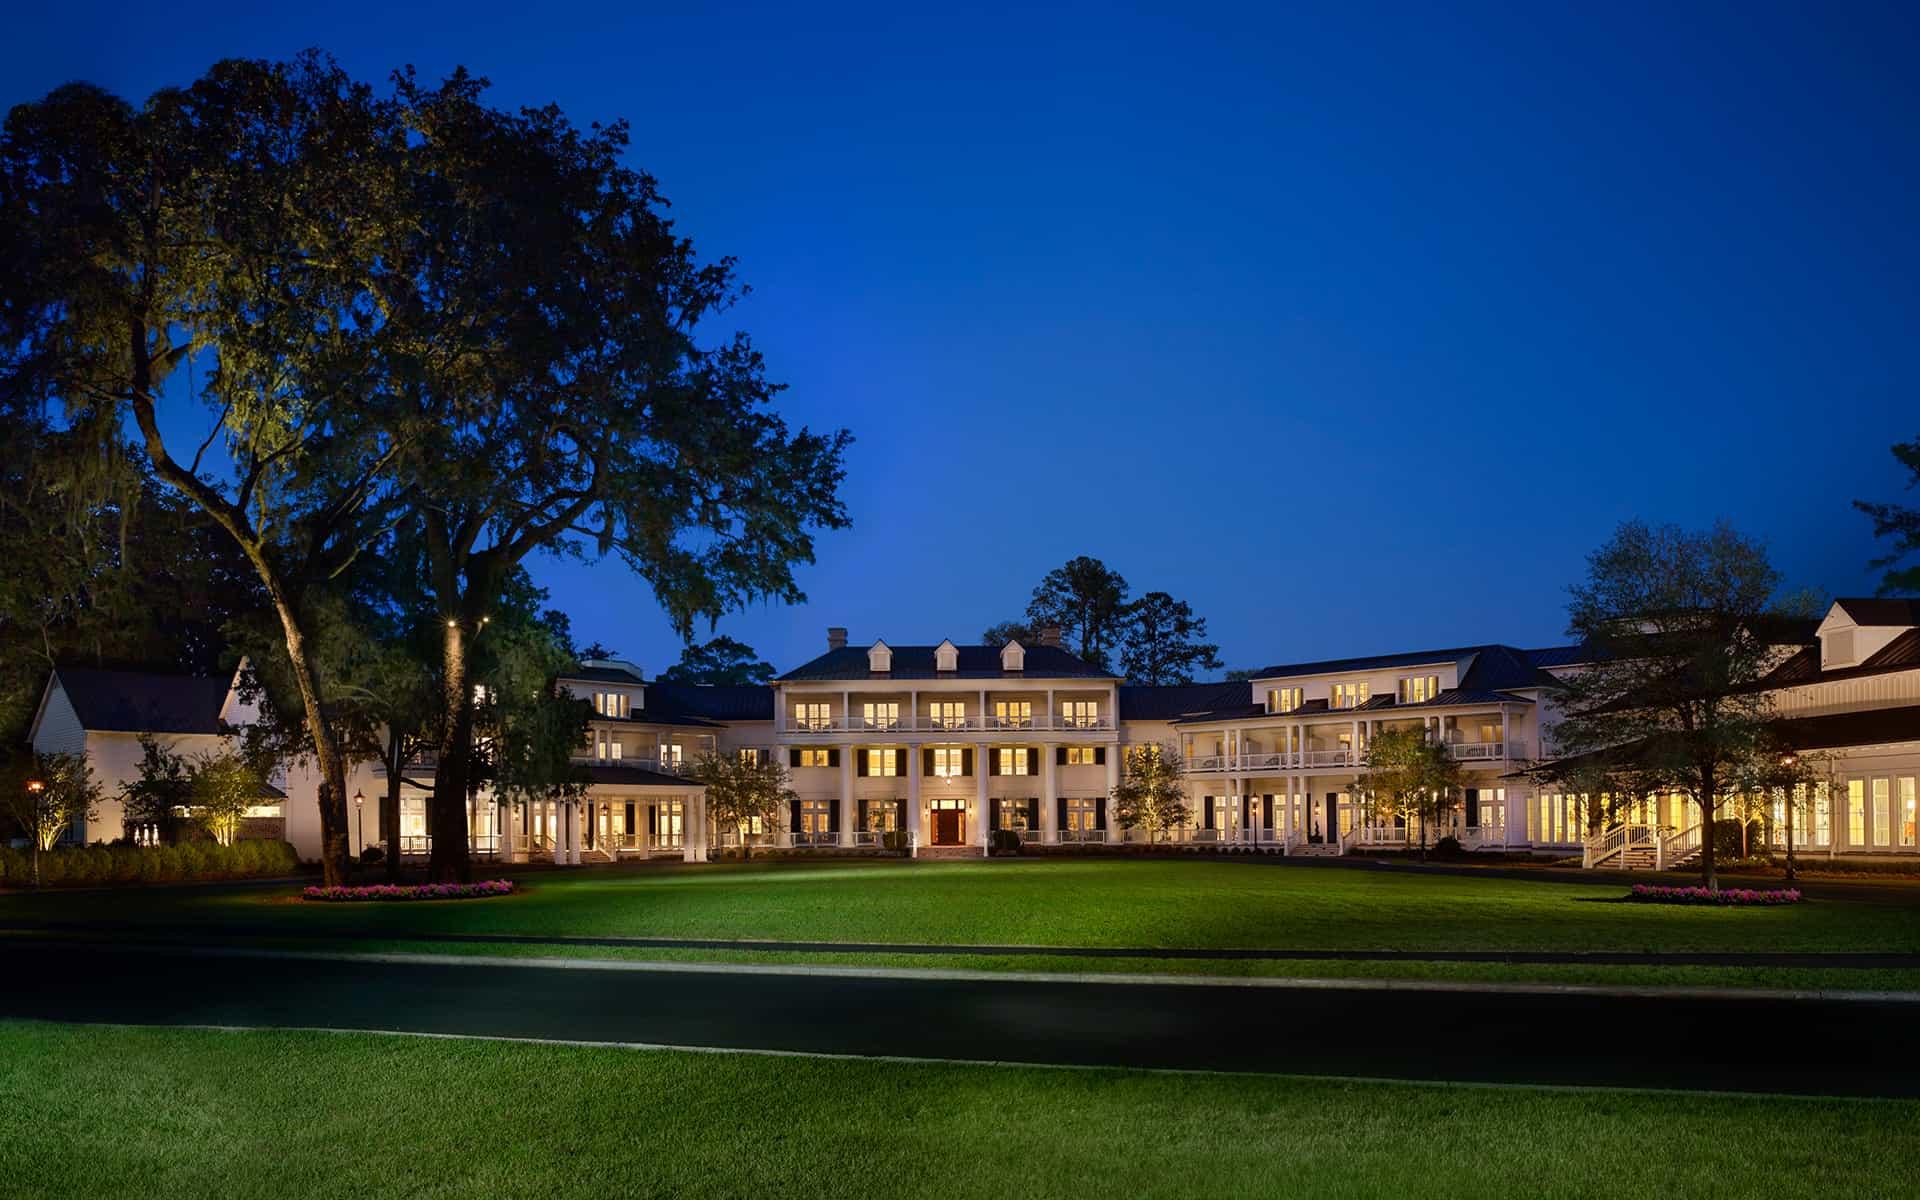 Luxury South Carolina Resort Image Gallery Montage